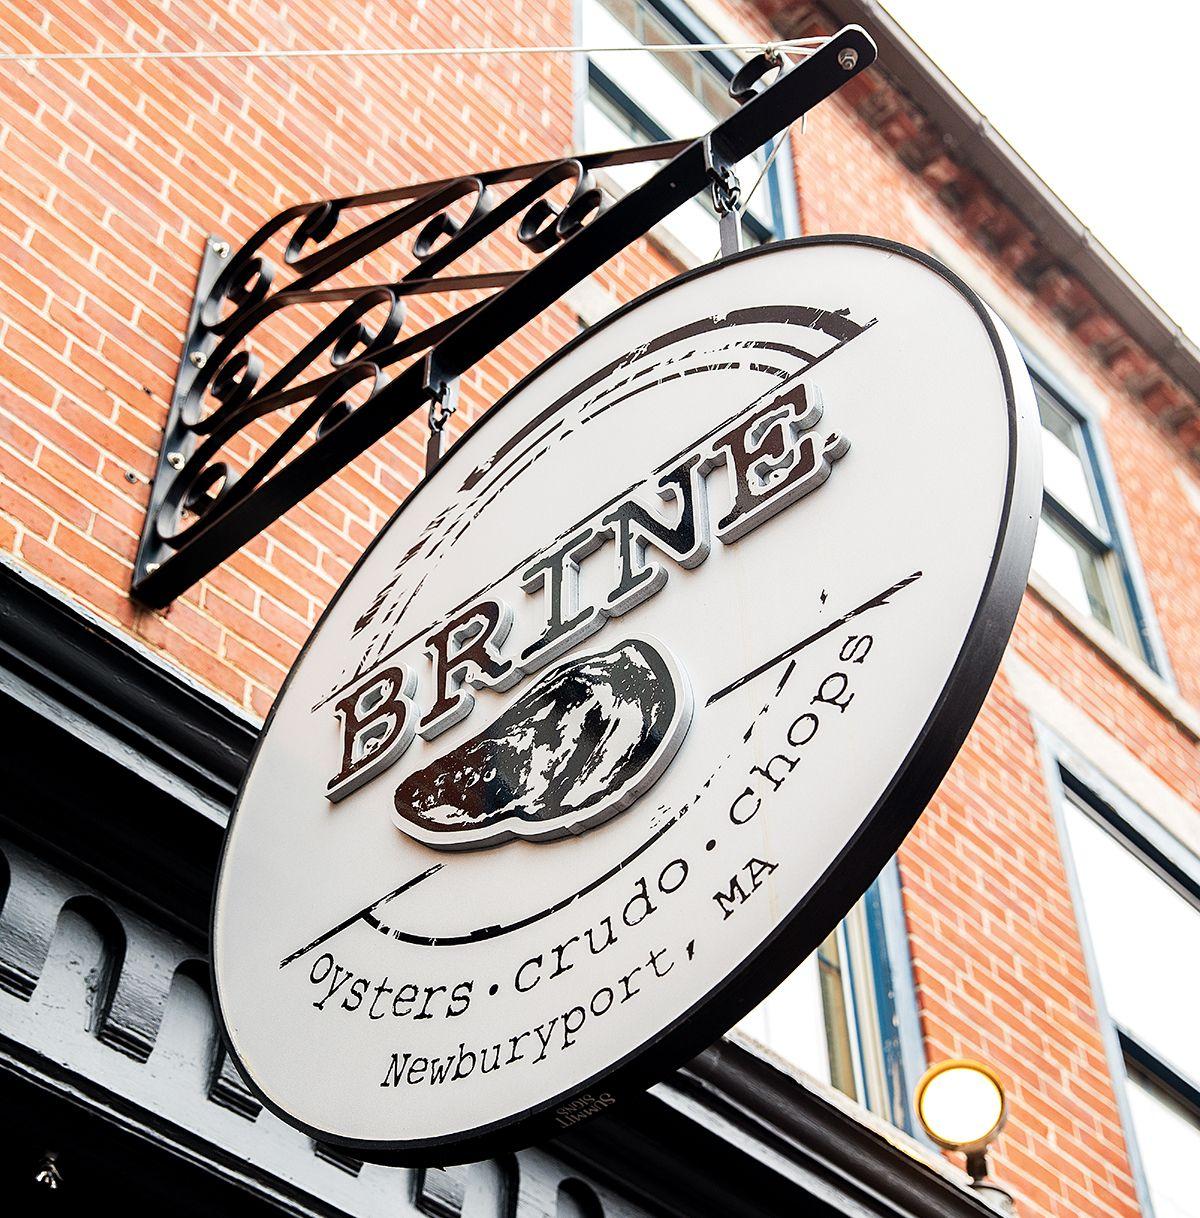 Brine Oyster Chop House Newburyport Ma Wonderful Place To Eat Such A Restaurants